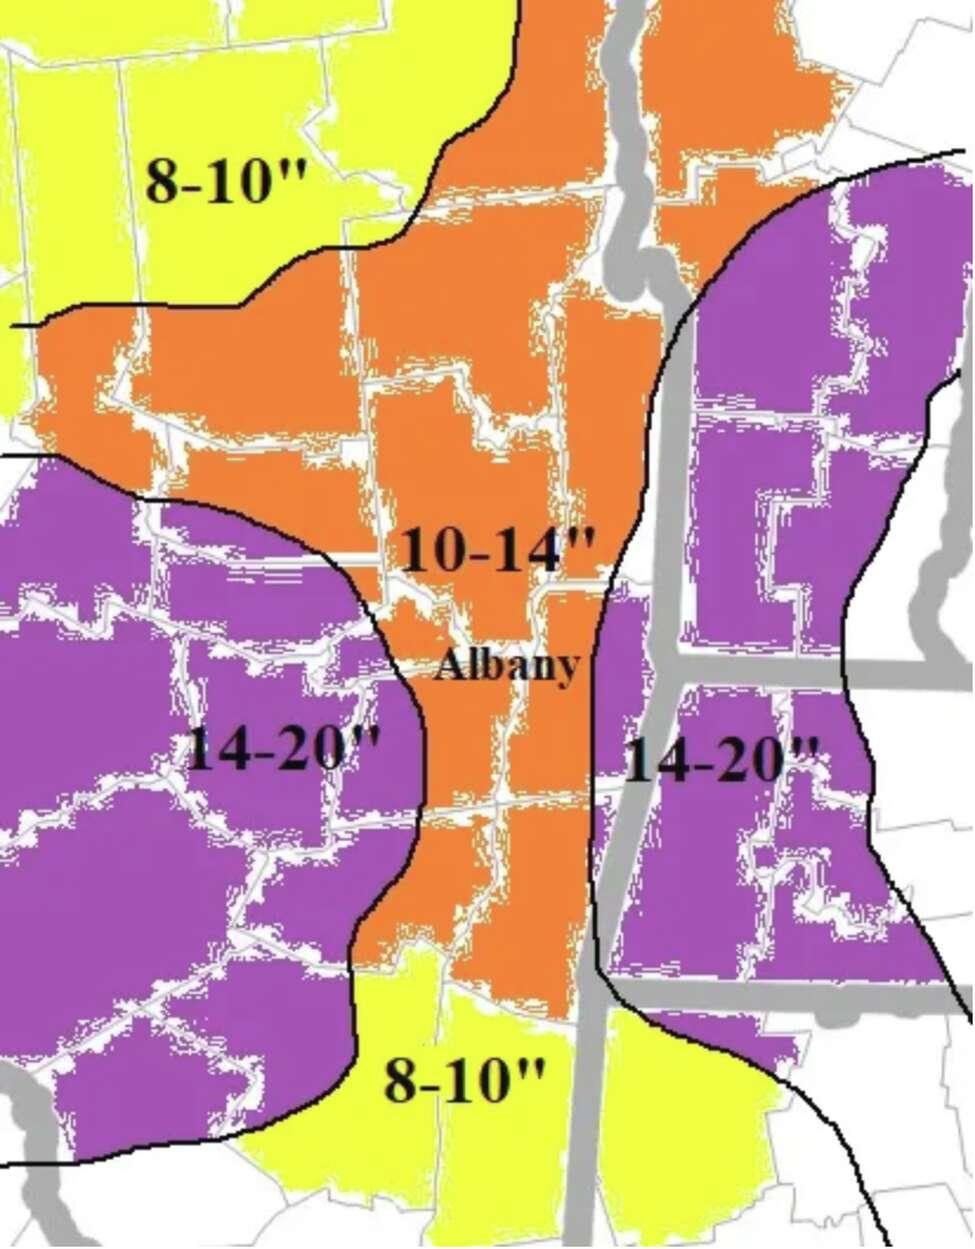 Snowfall forecast map from December 1, 2019.